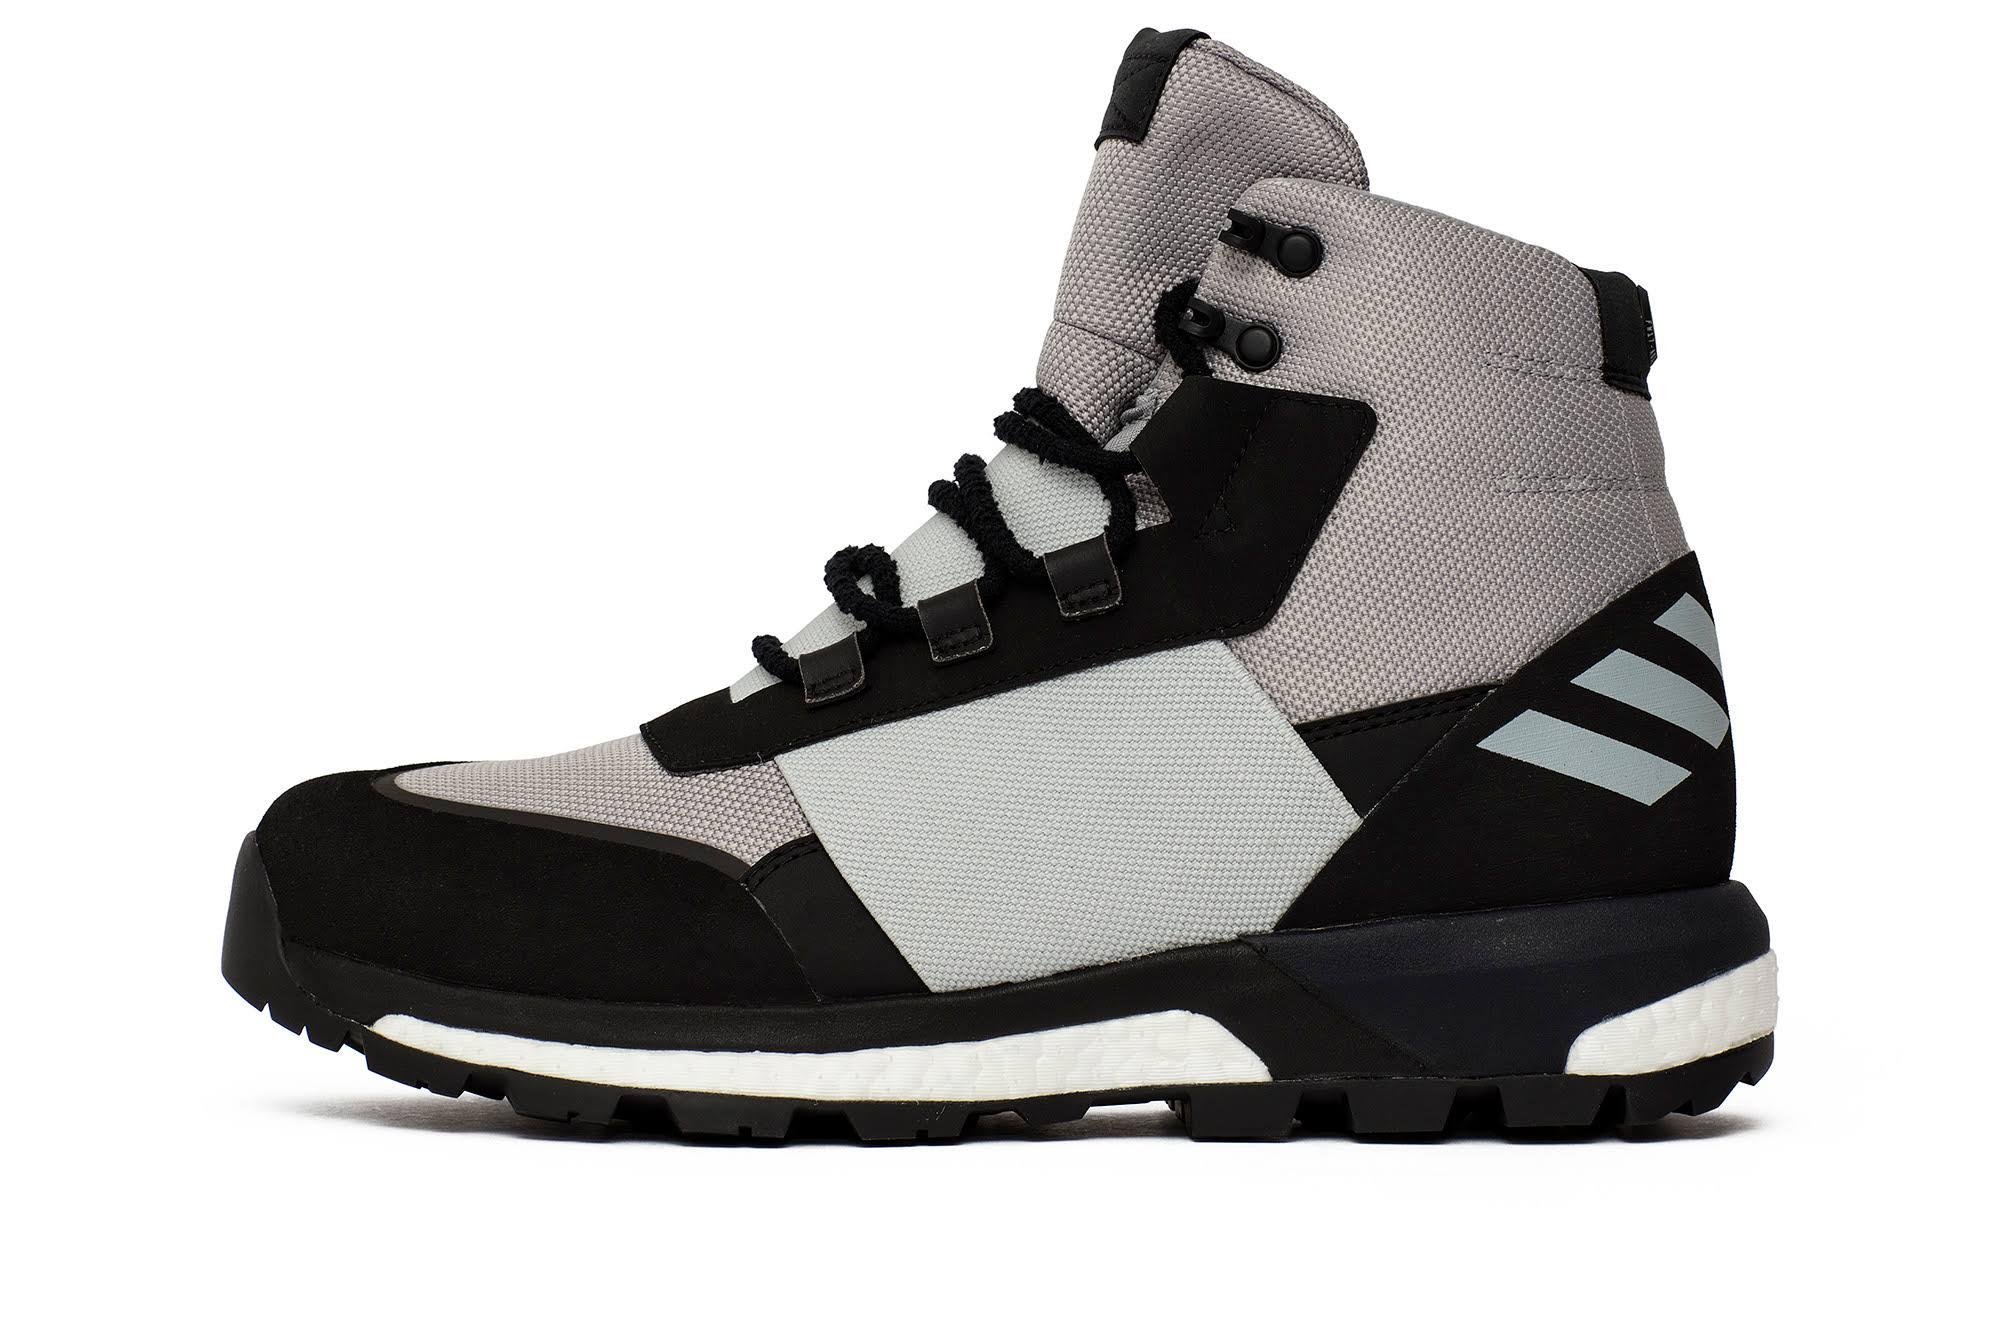 43⅓ One Adidas Ultimate Boot Ado Day cq2609 w6qqxYSvEz